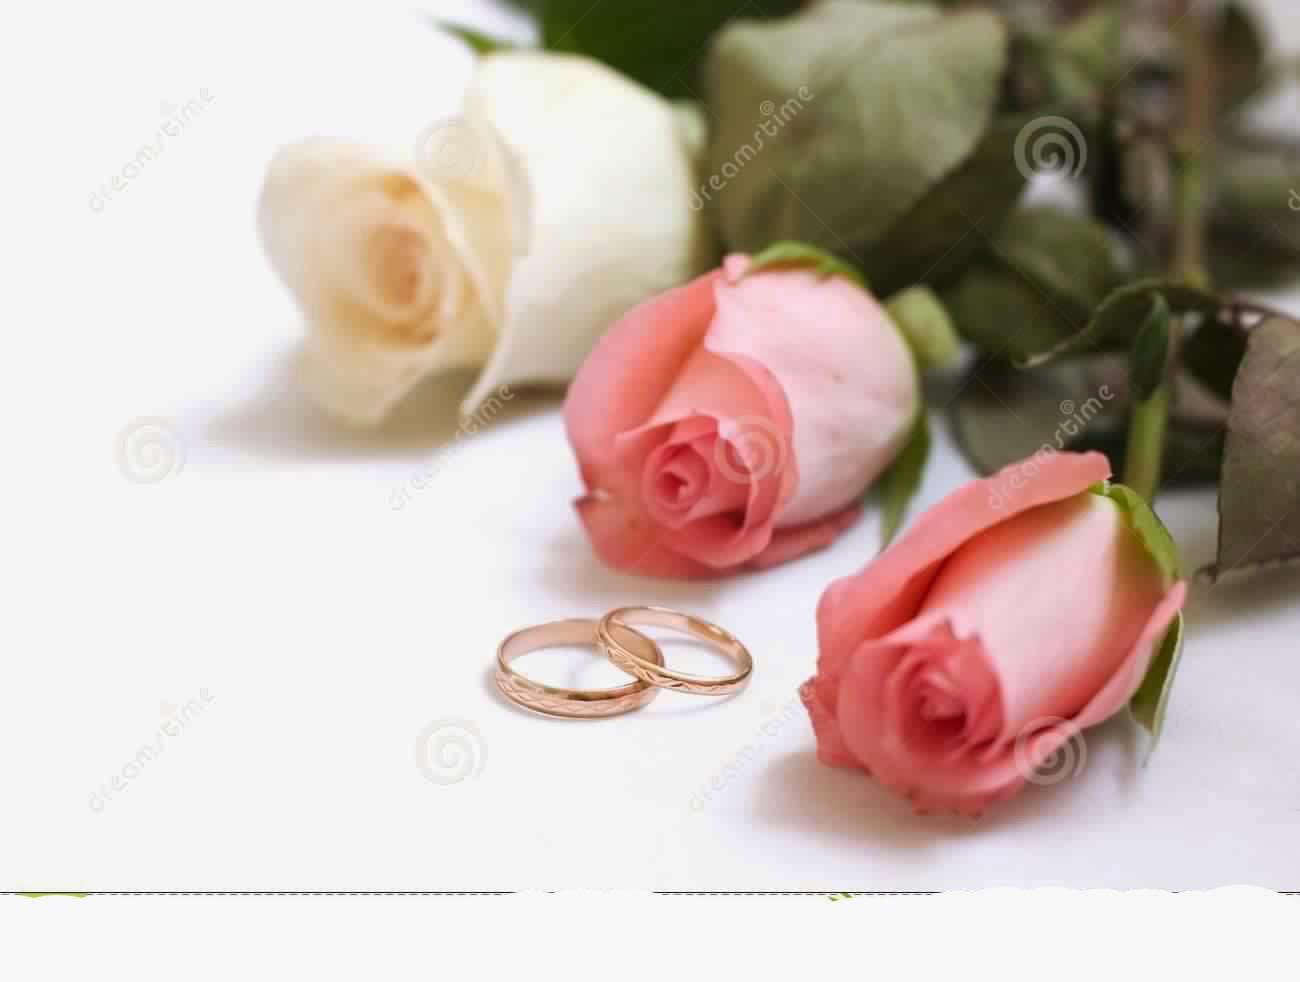 idee texte carte mariage invitation mariage carte mariage texte mariage cadeau mariage. Black Bedroom Furniture Sets. Home Design Ideas